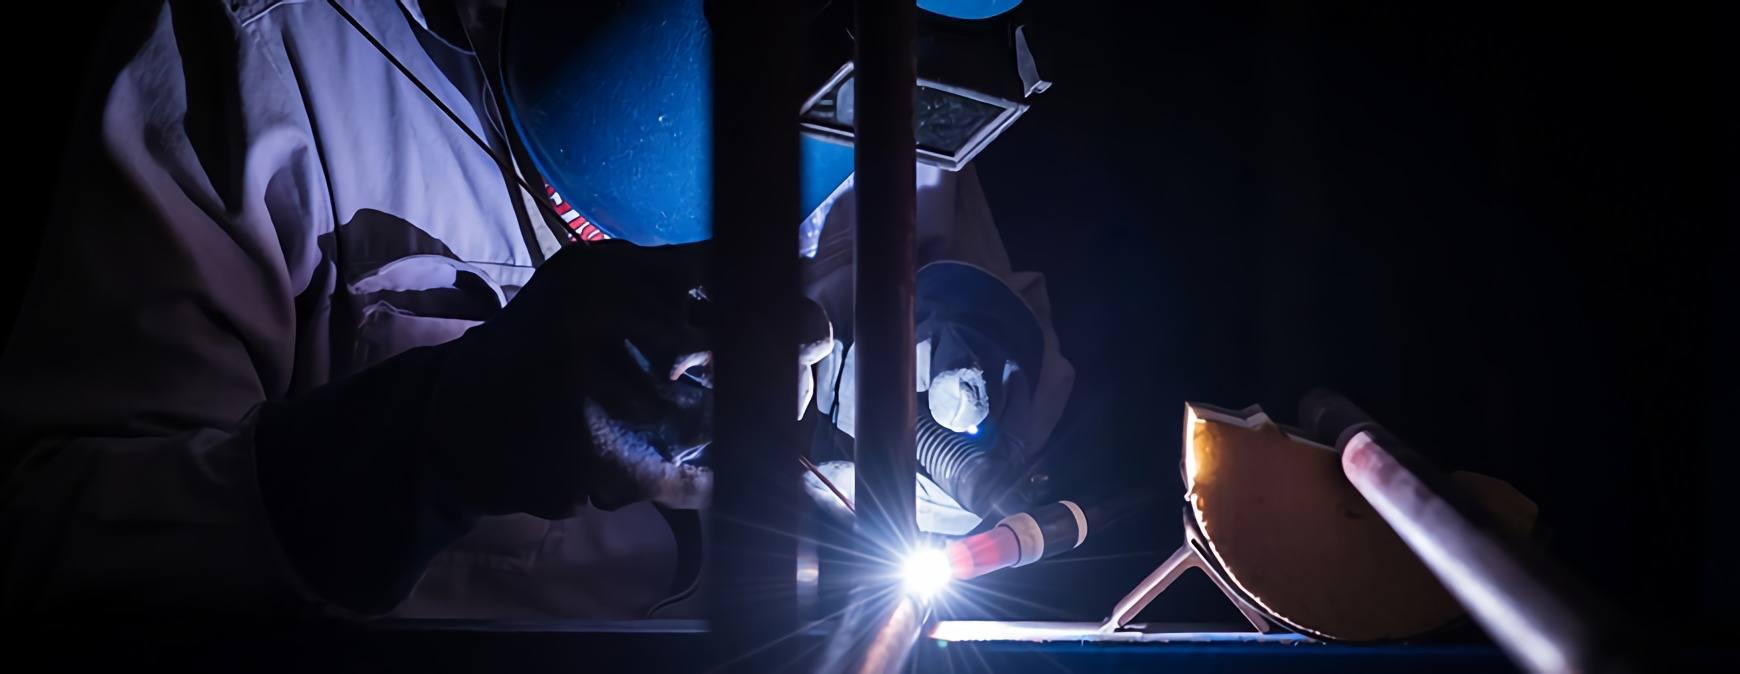 mig welding setup